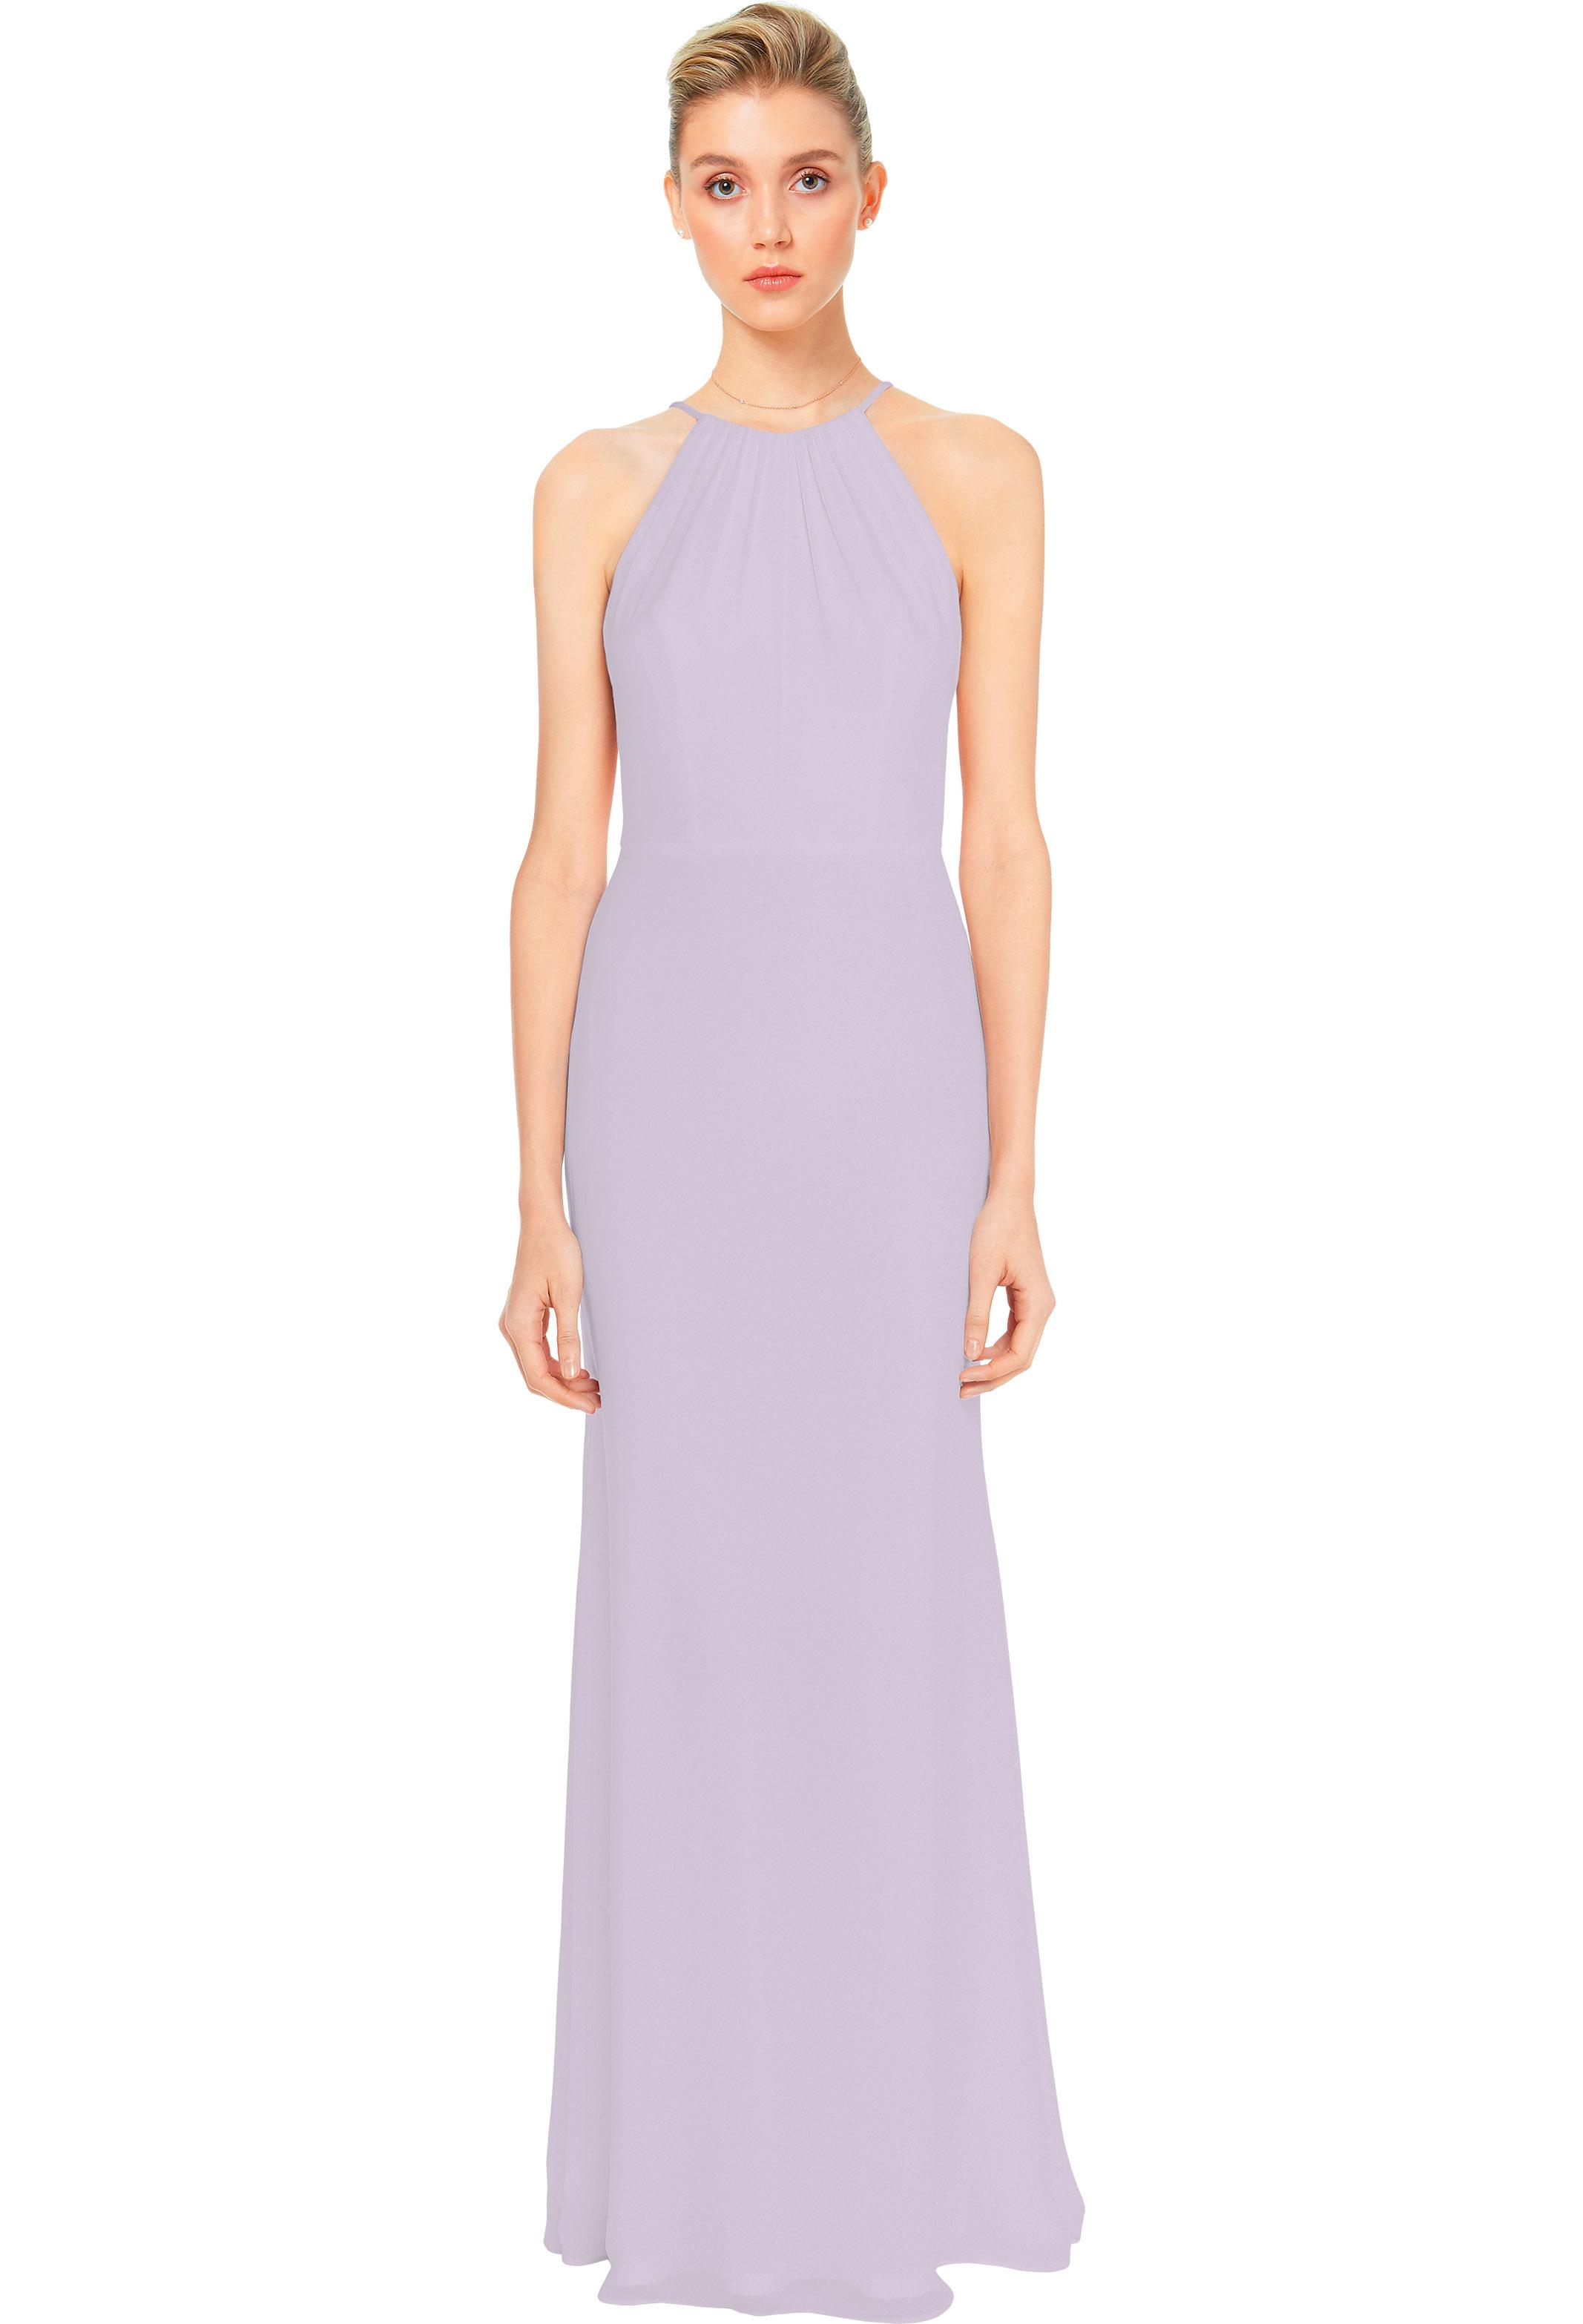 Bill Levkoff VIOLET Chiffon Spaghetti Strap A-line gown, $158.00 Front